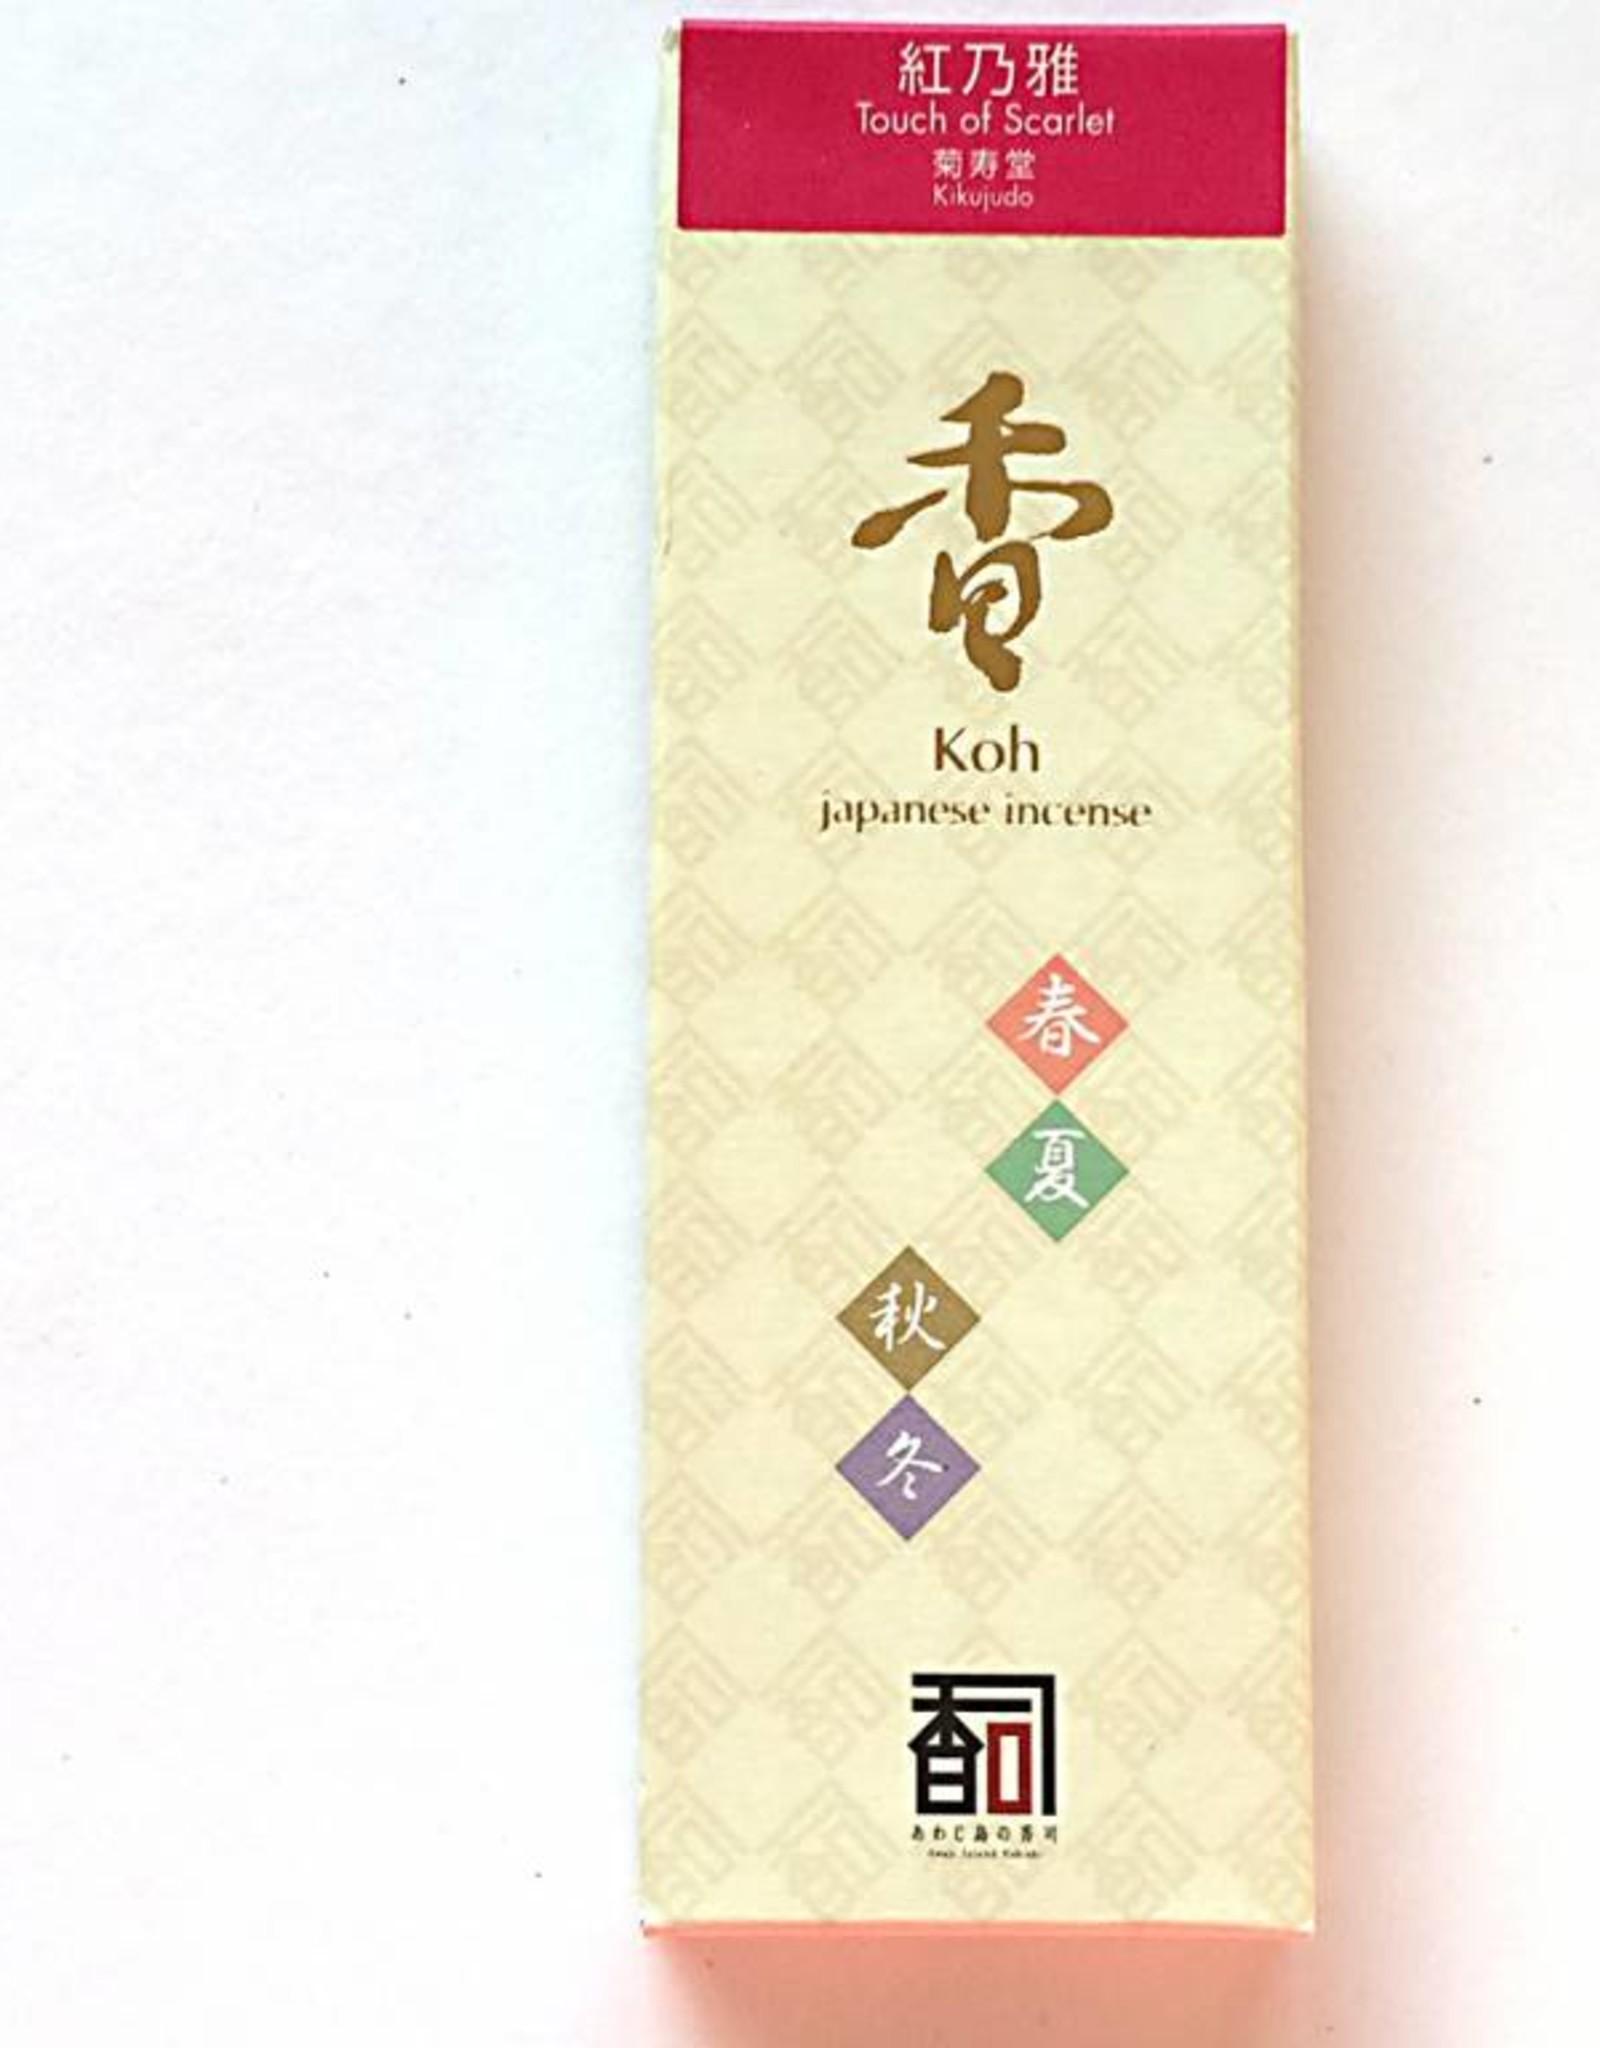 Awaji Island Koh-shi Japanese incense Touch of Scarlet (103)